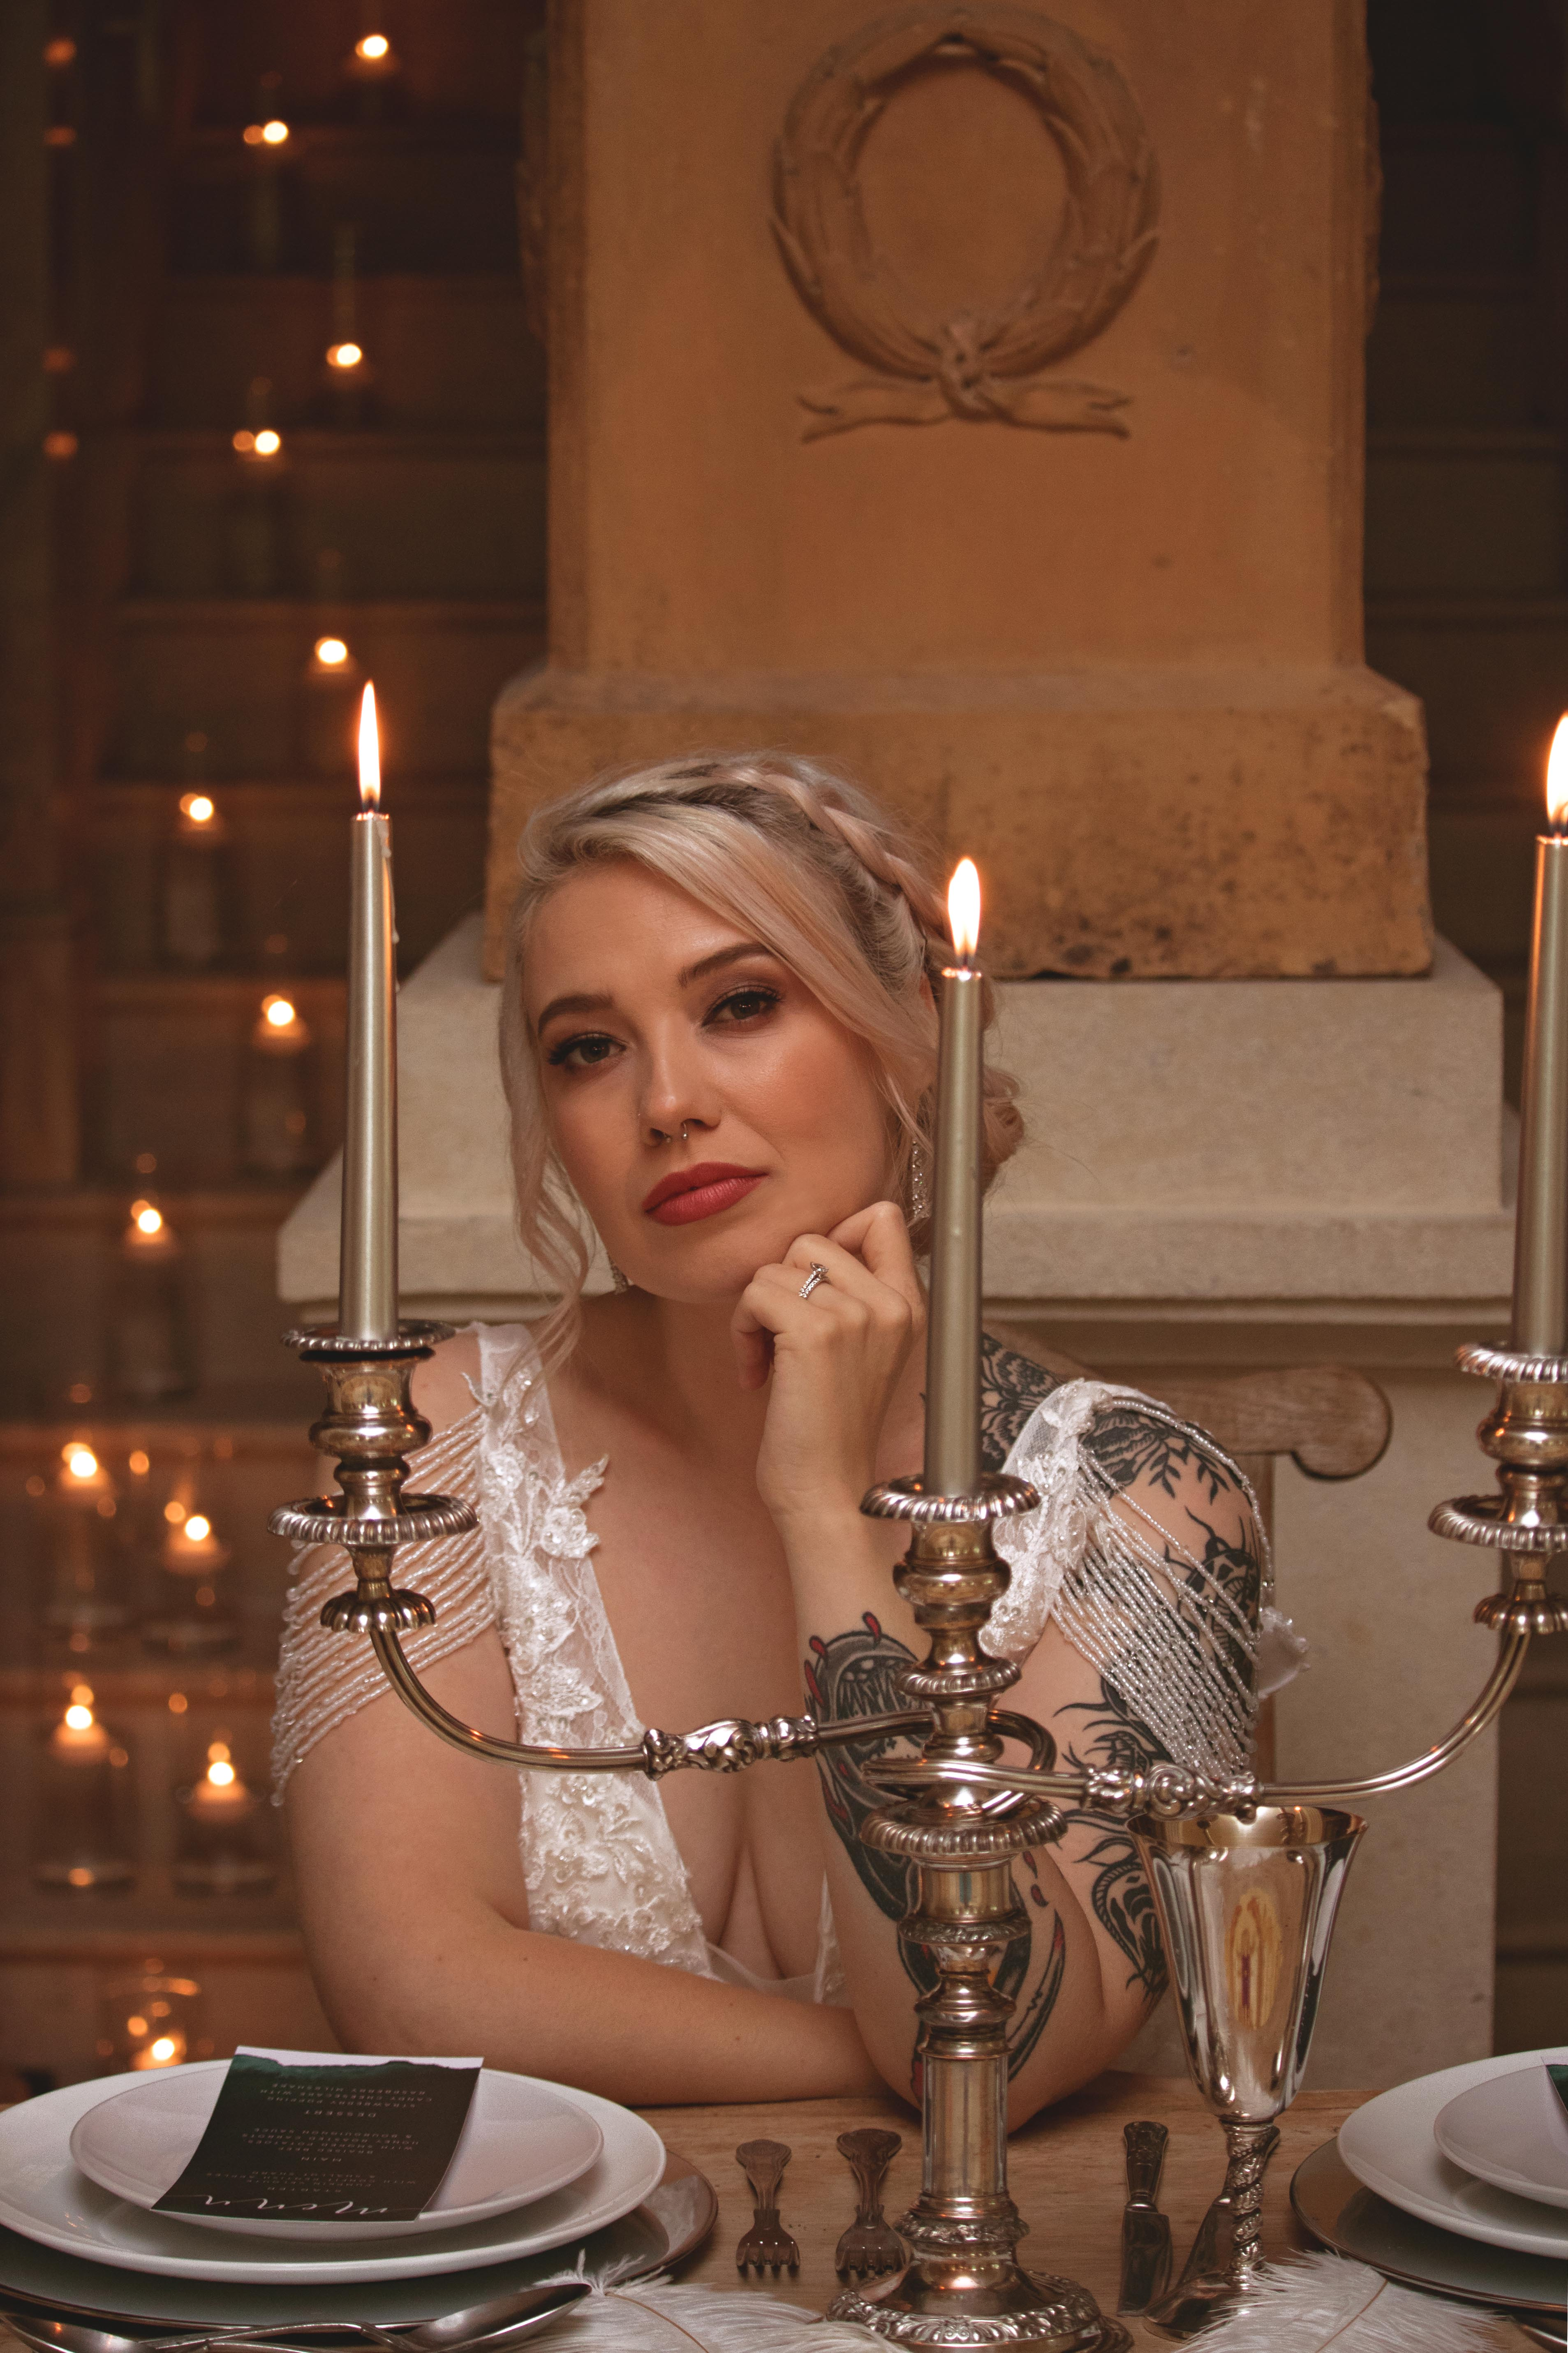 Candle Lit Bridal Portraits at Euridge Manor Same Sex Wedding Reception